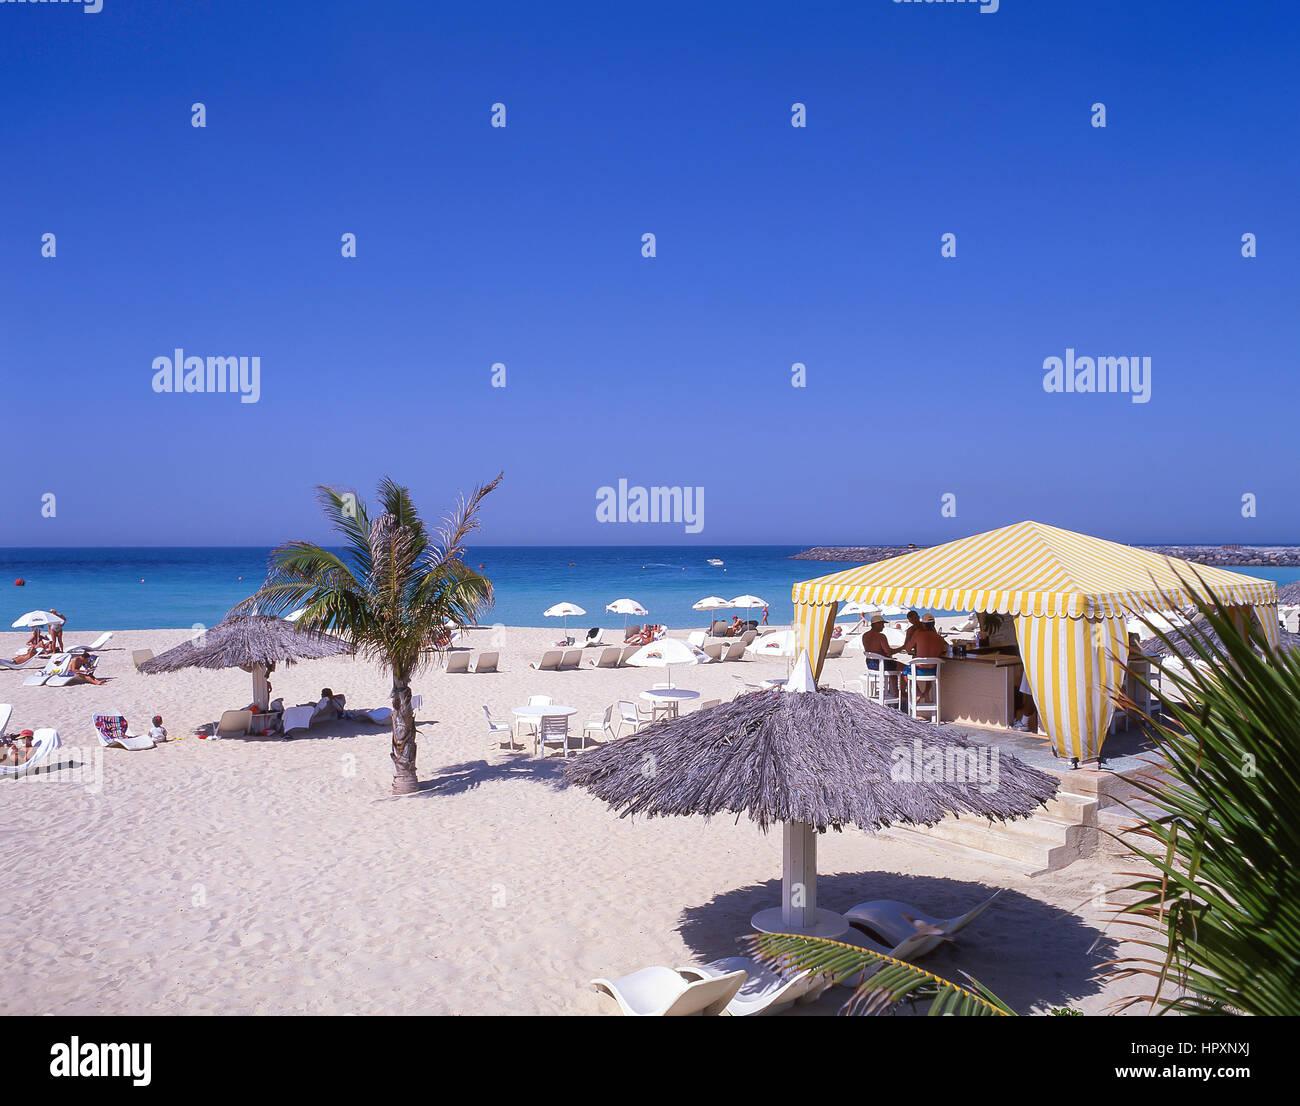 La playa de Jumeirah, Jumeirah, Dubai, Emiratos Árabes Unidos. Imagen De Stock